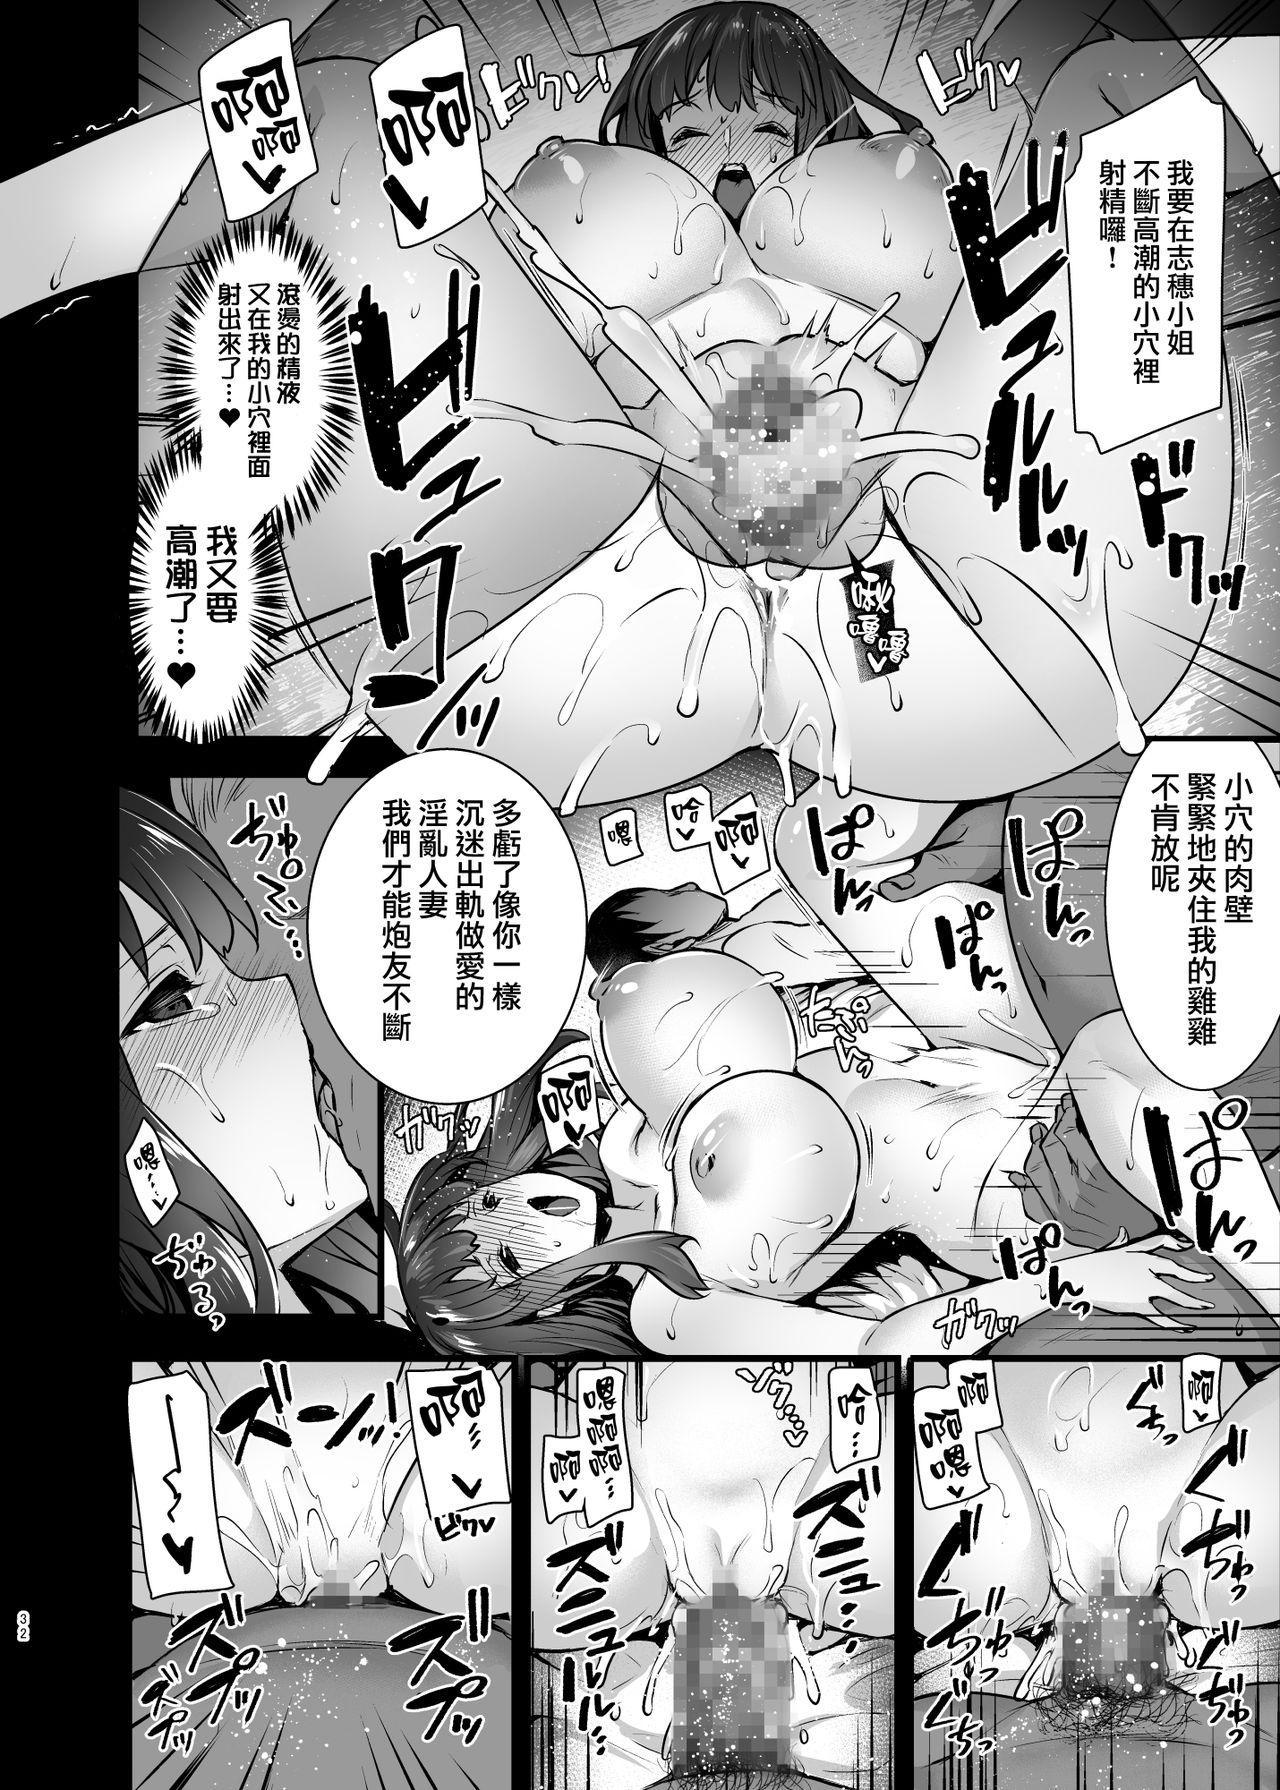 Rental Tanetsuke Oji-san 2 After 30